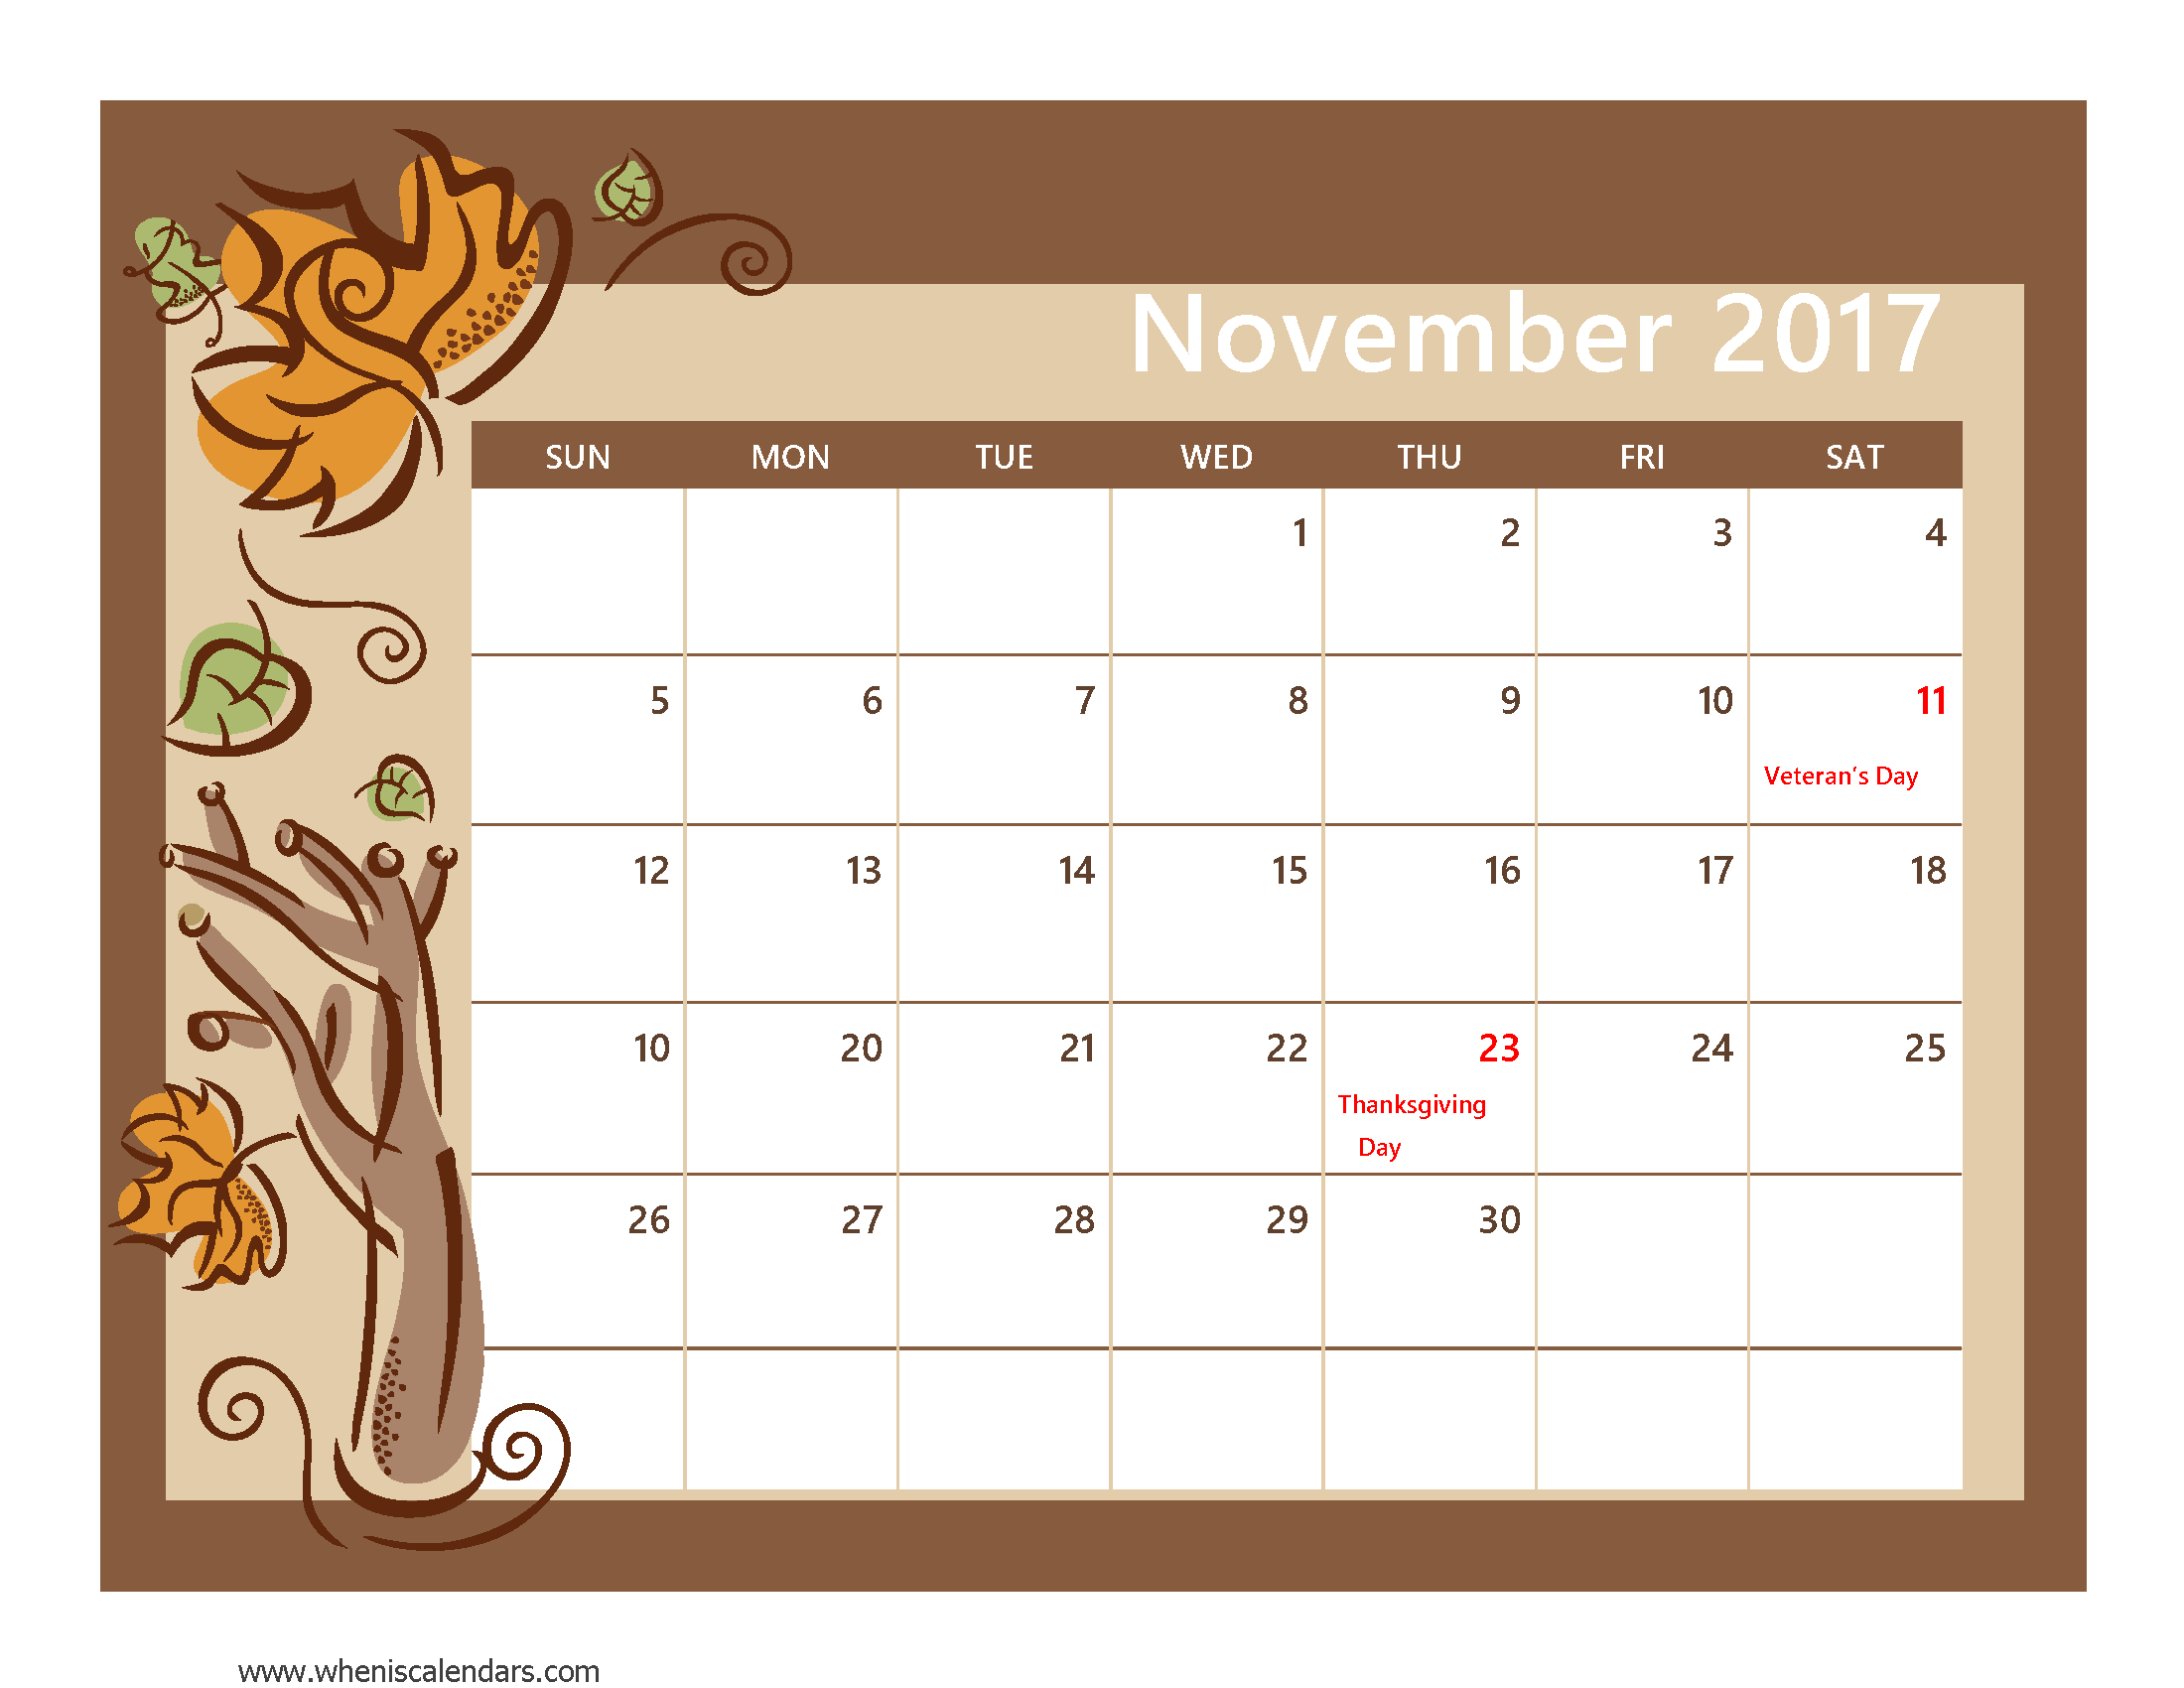 November 2017 Calendar Template | weekly calendar template